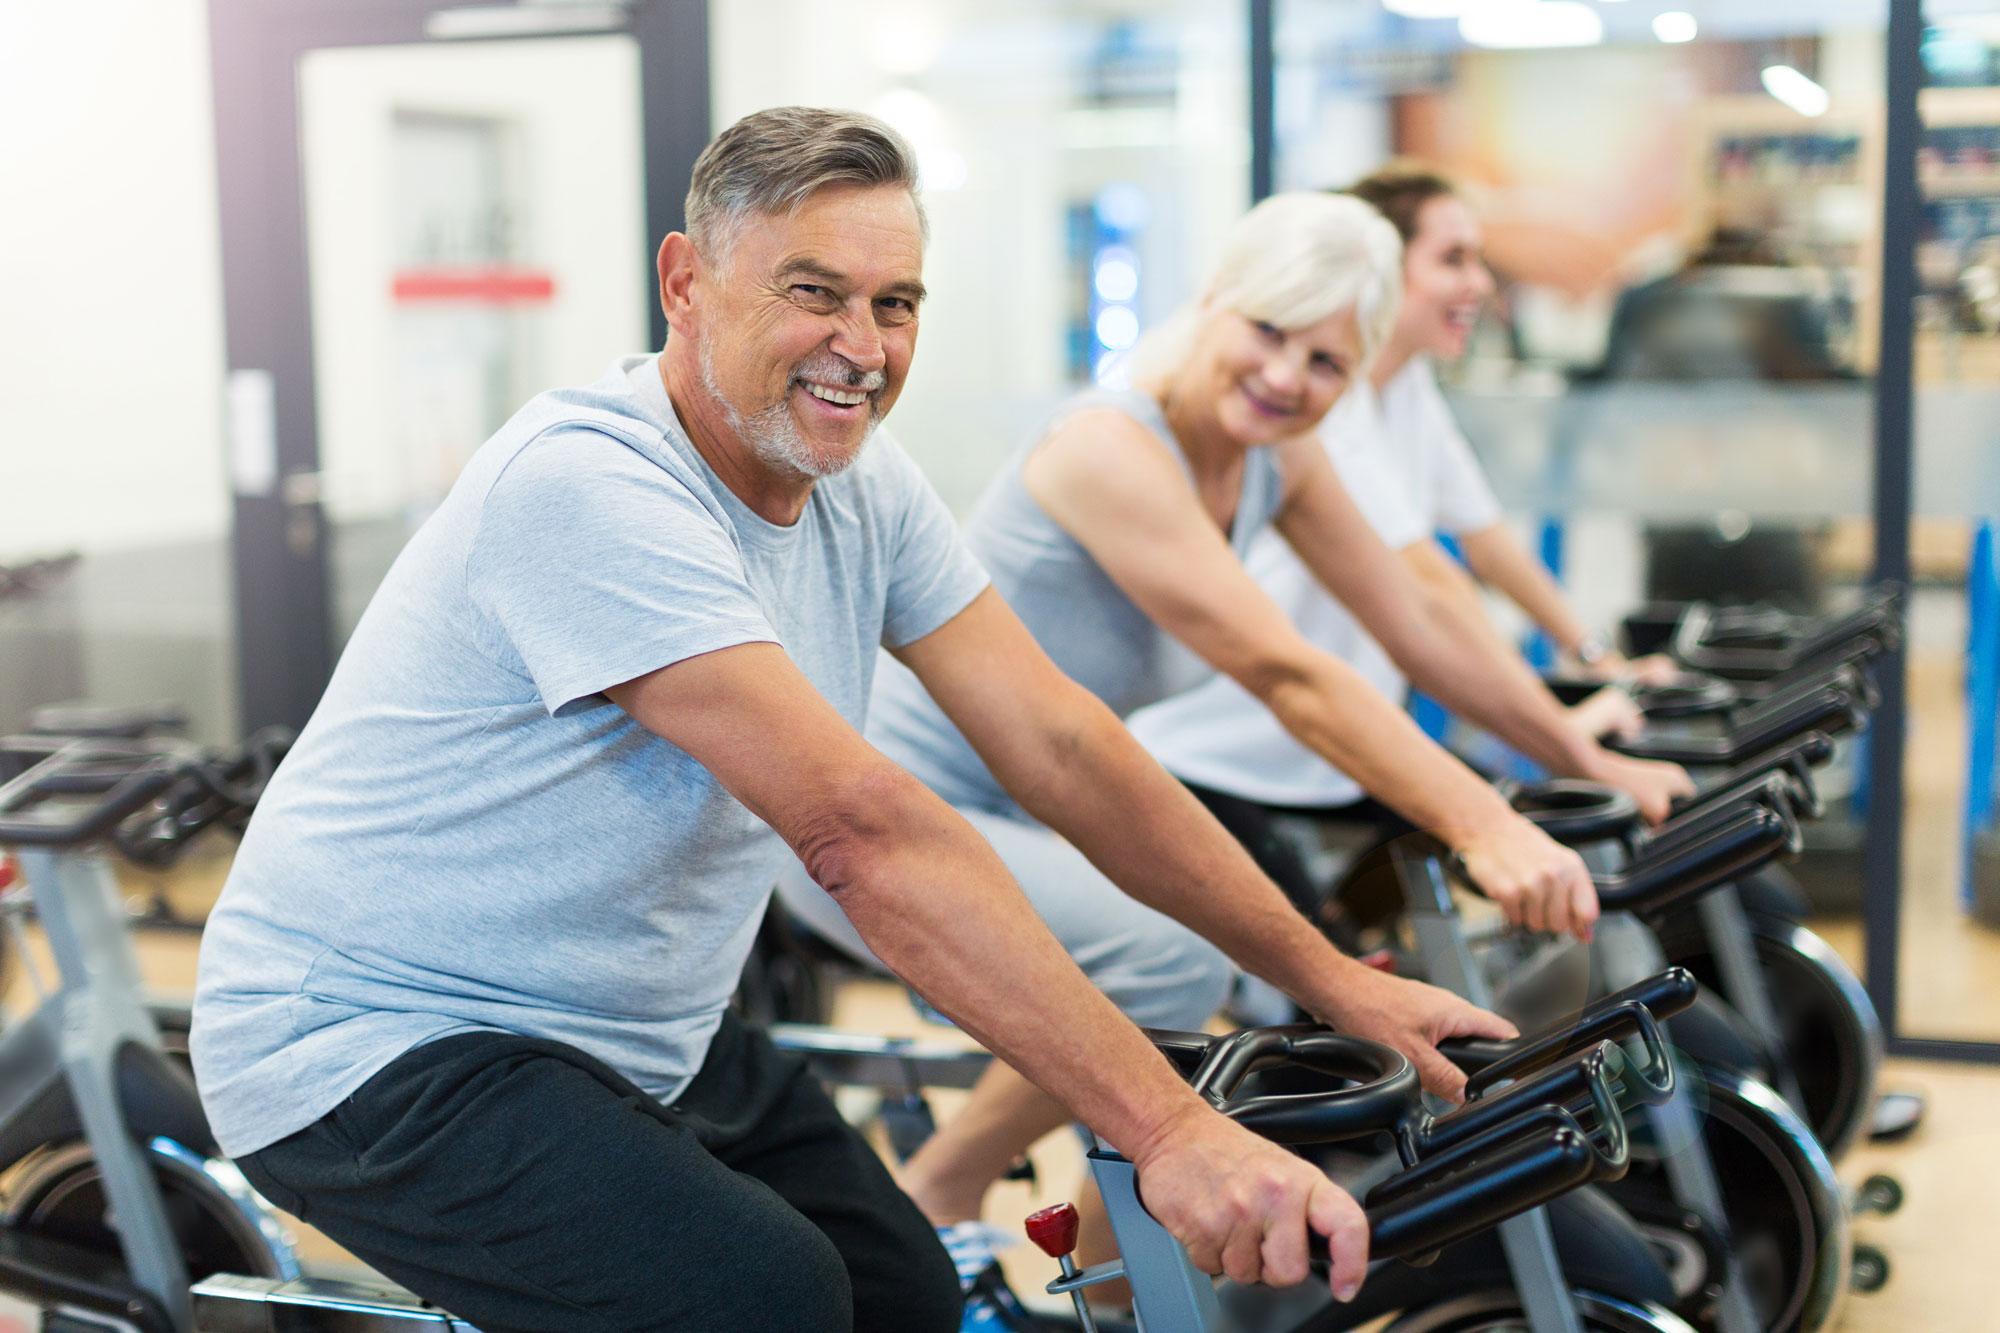 Exercises for Vein Health